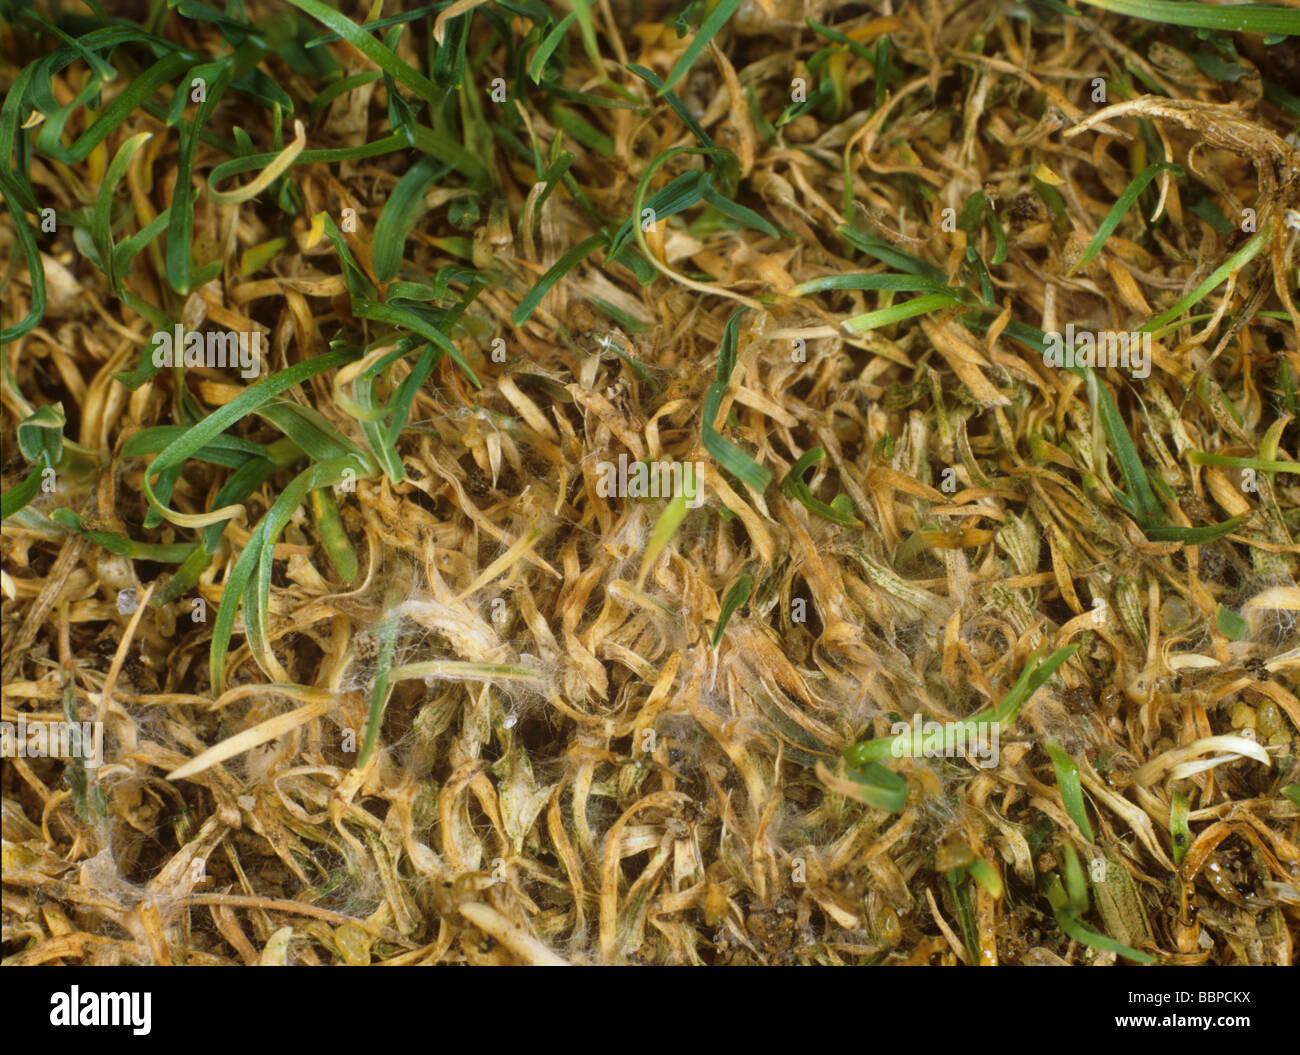 Leaf blight Ascochyta hordeicola mycelium and damage on lawn turfgrass - Stock Image